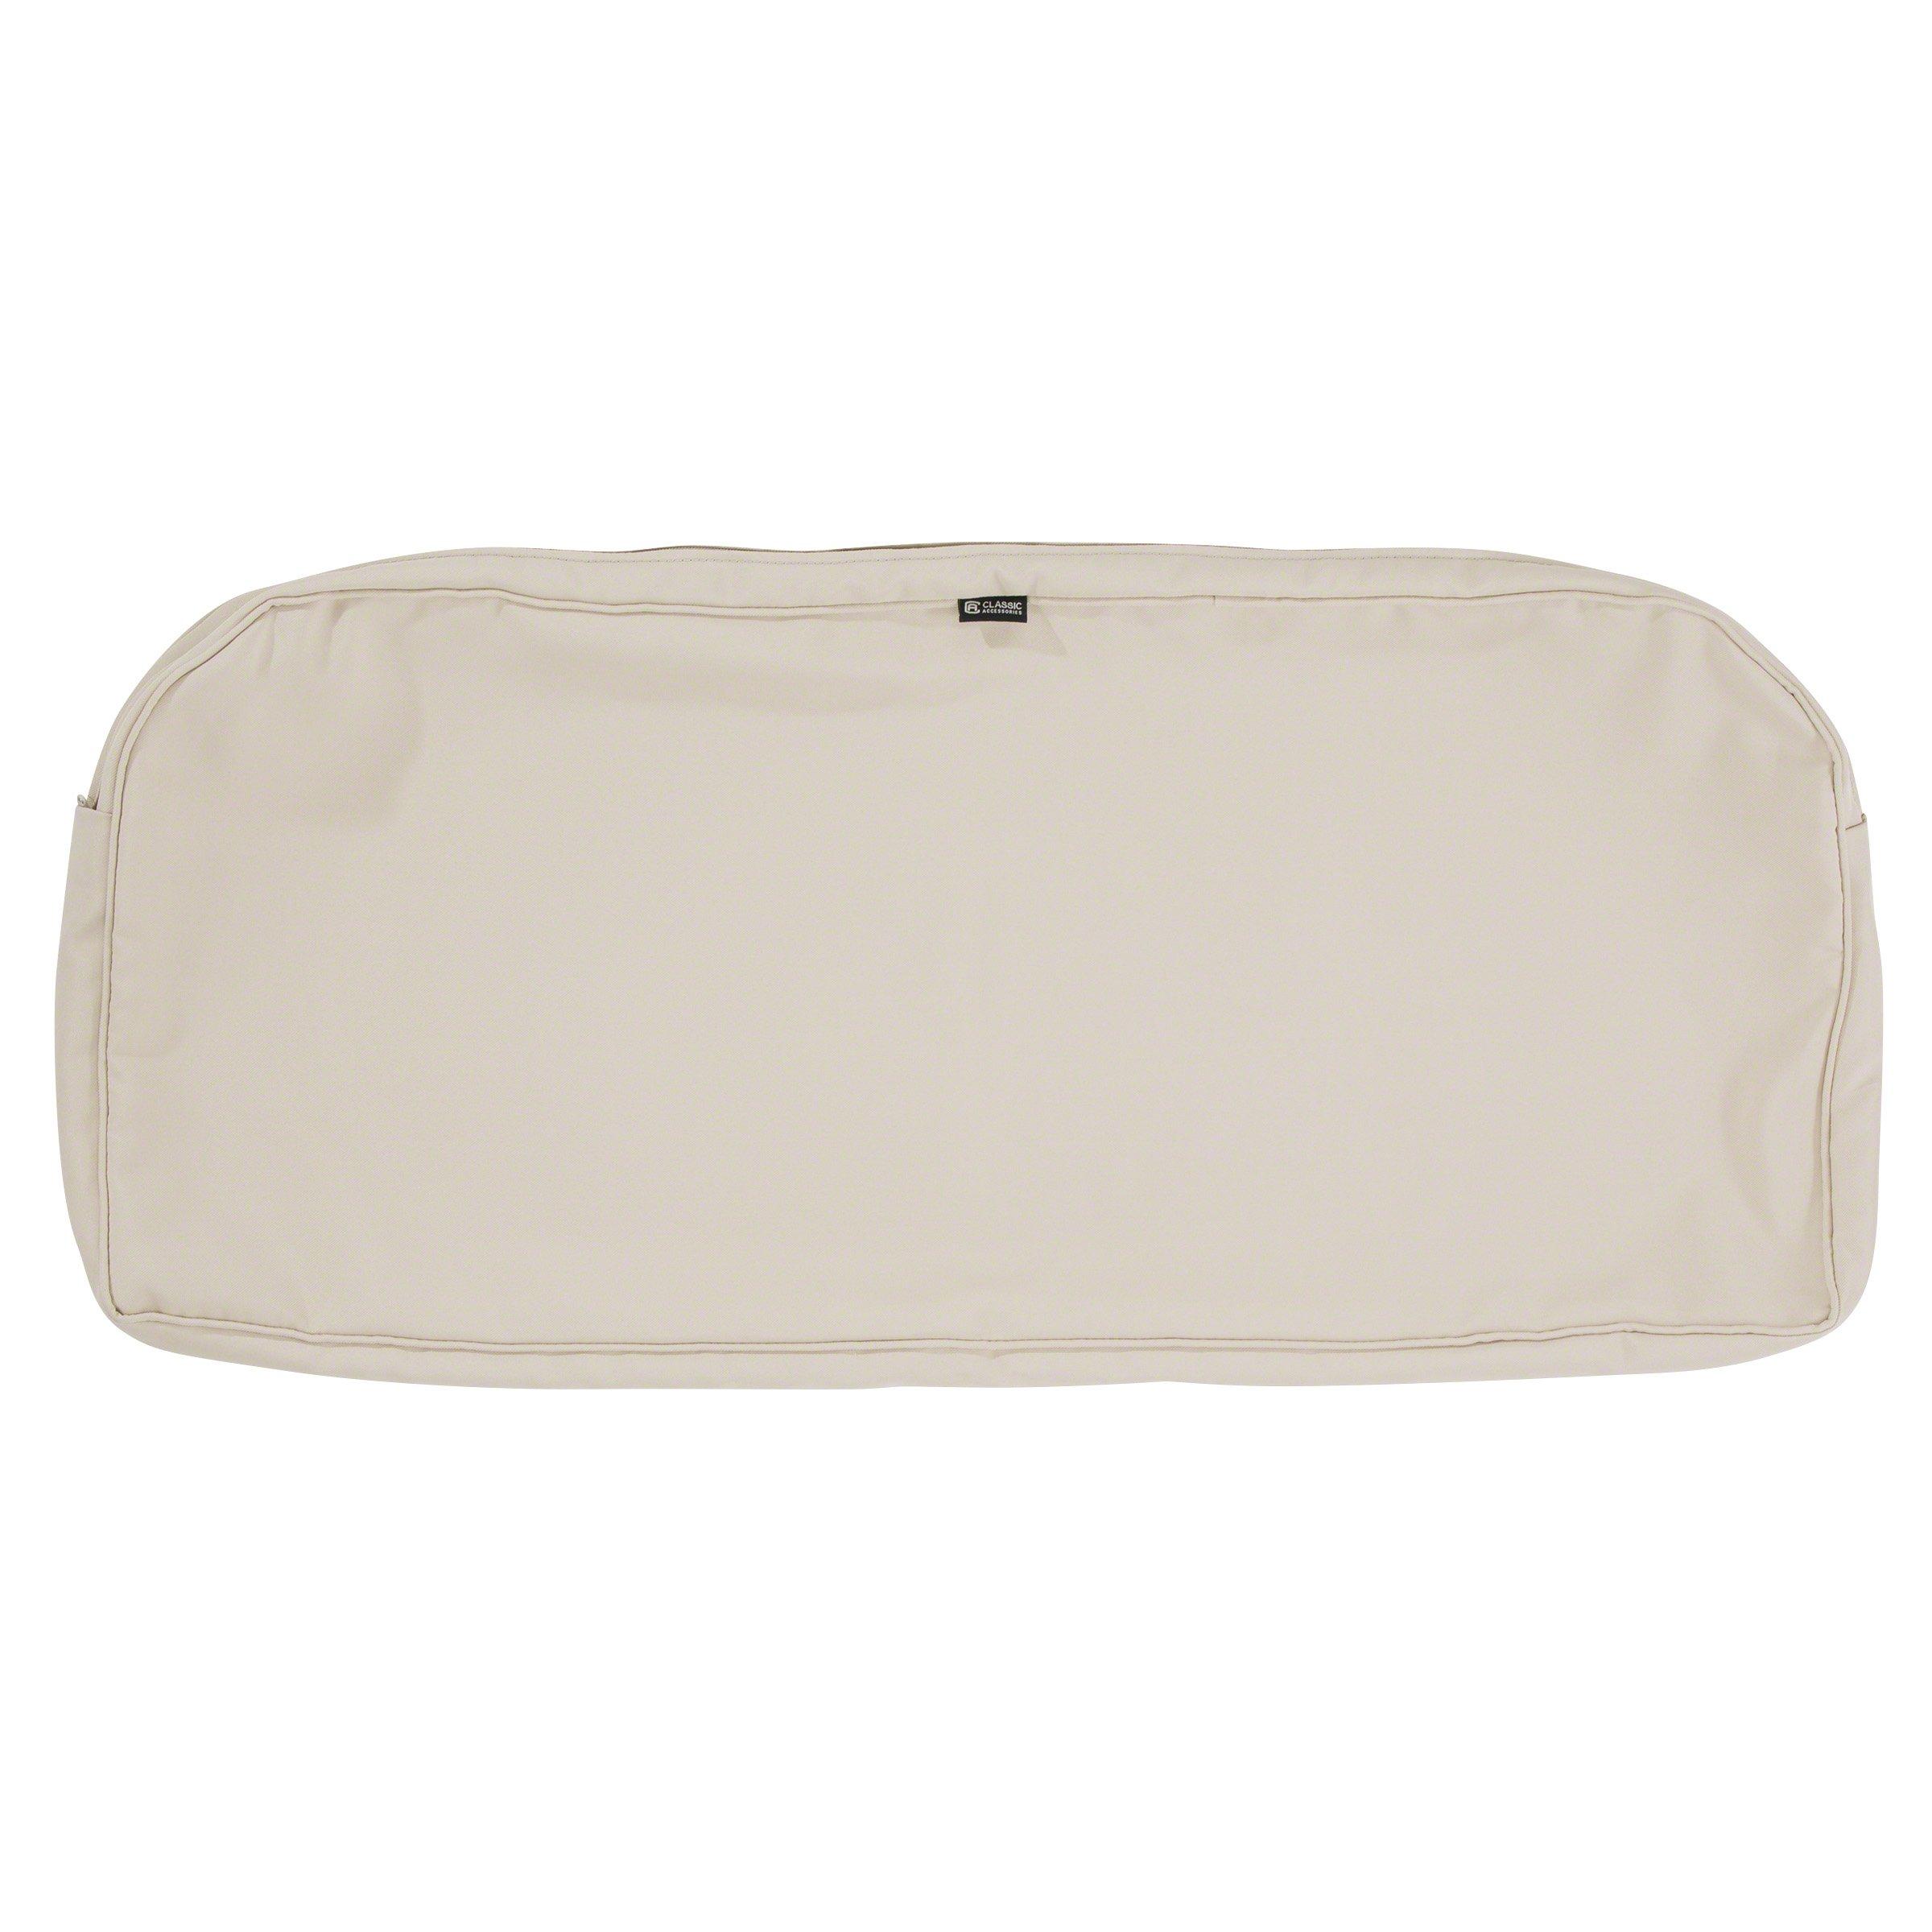 Classic Accessories Montlake Patio Bench Seat Cushion Slip Cover, Antique Beige, 41x18x3 Contoured